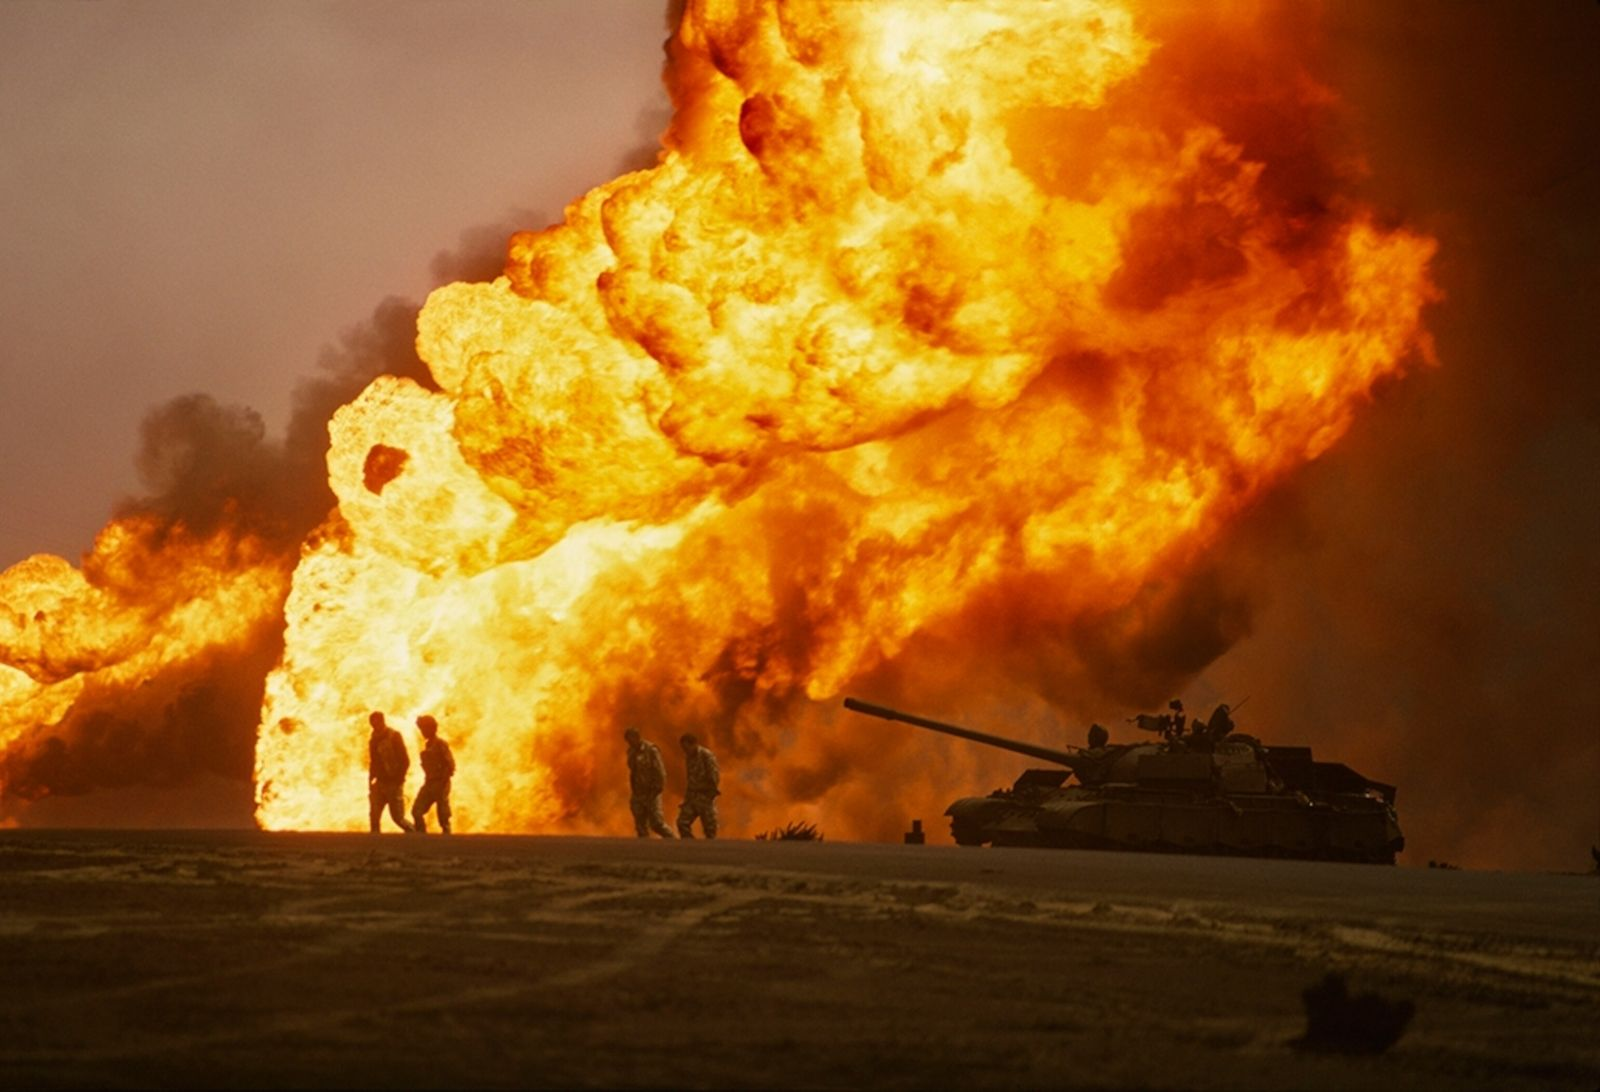 Retreating Iraqis set the Burgan oil fields ablaze. Soon an oily, toxic cloud more than 30 ...